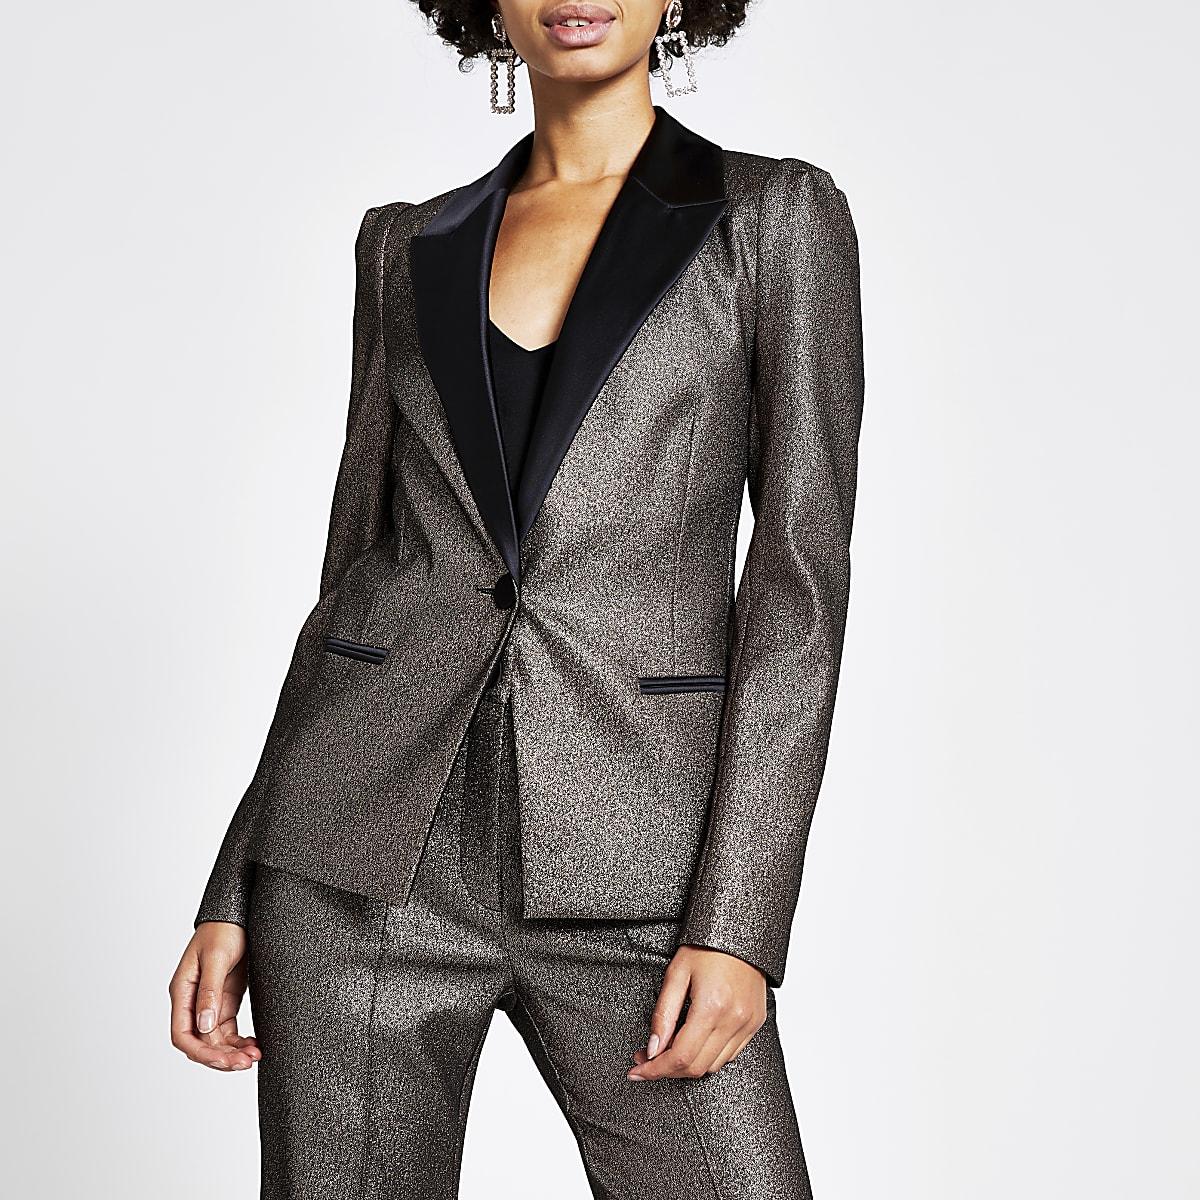 Bronze metallic sleeve blazer